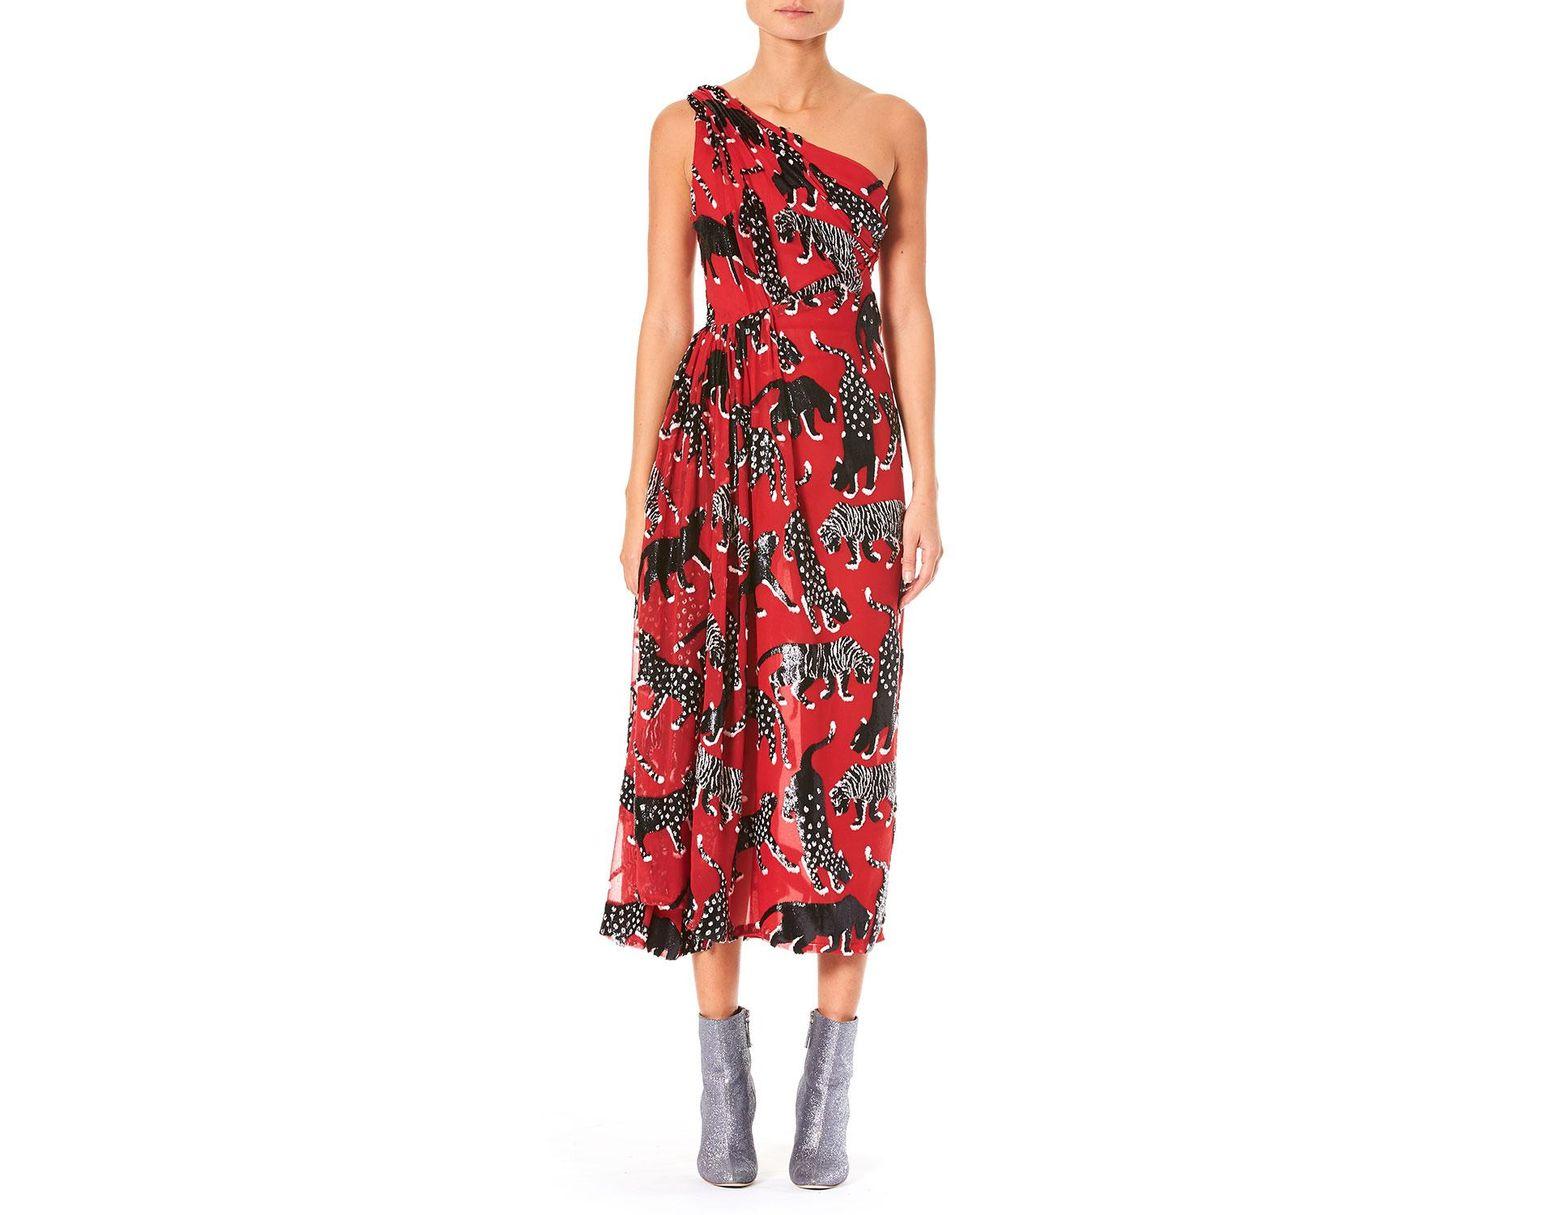 73f1086668f Lyst - Carolina Herrera One-shoulder Wildcat-print Cocktail Dress in ...